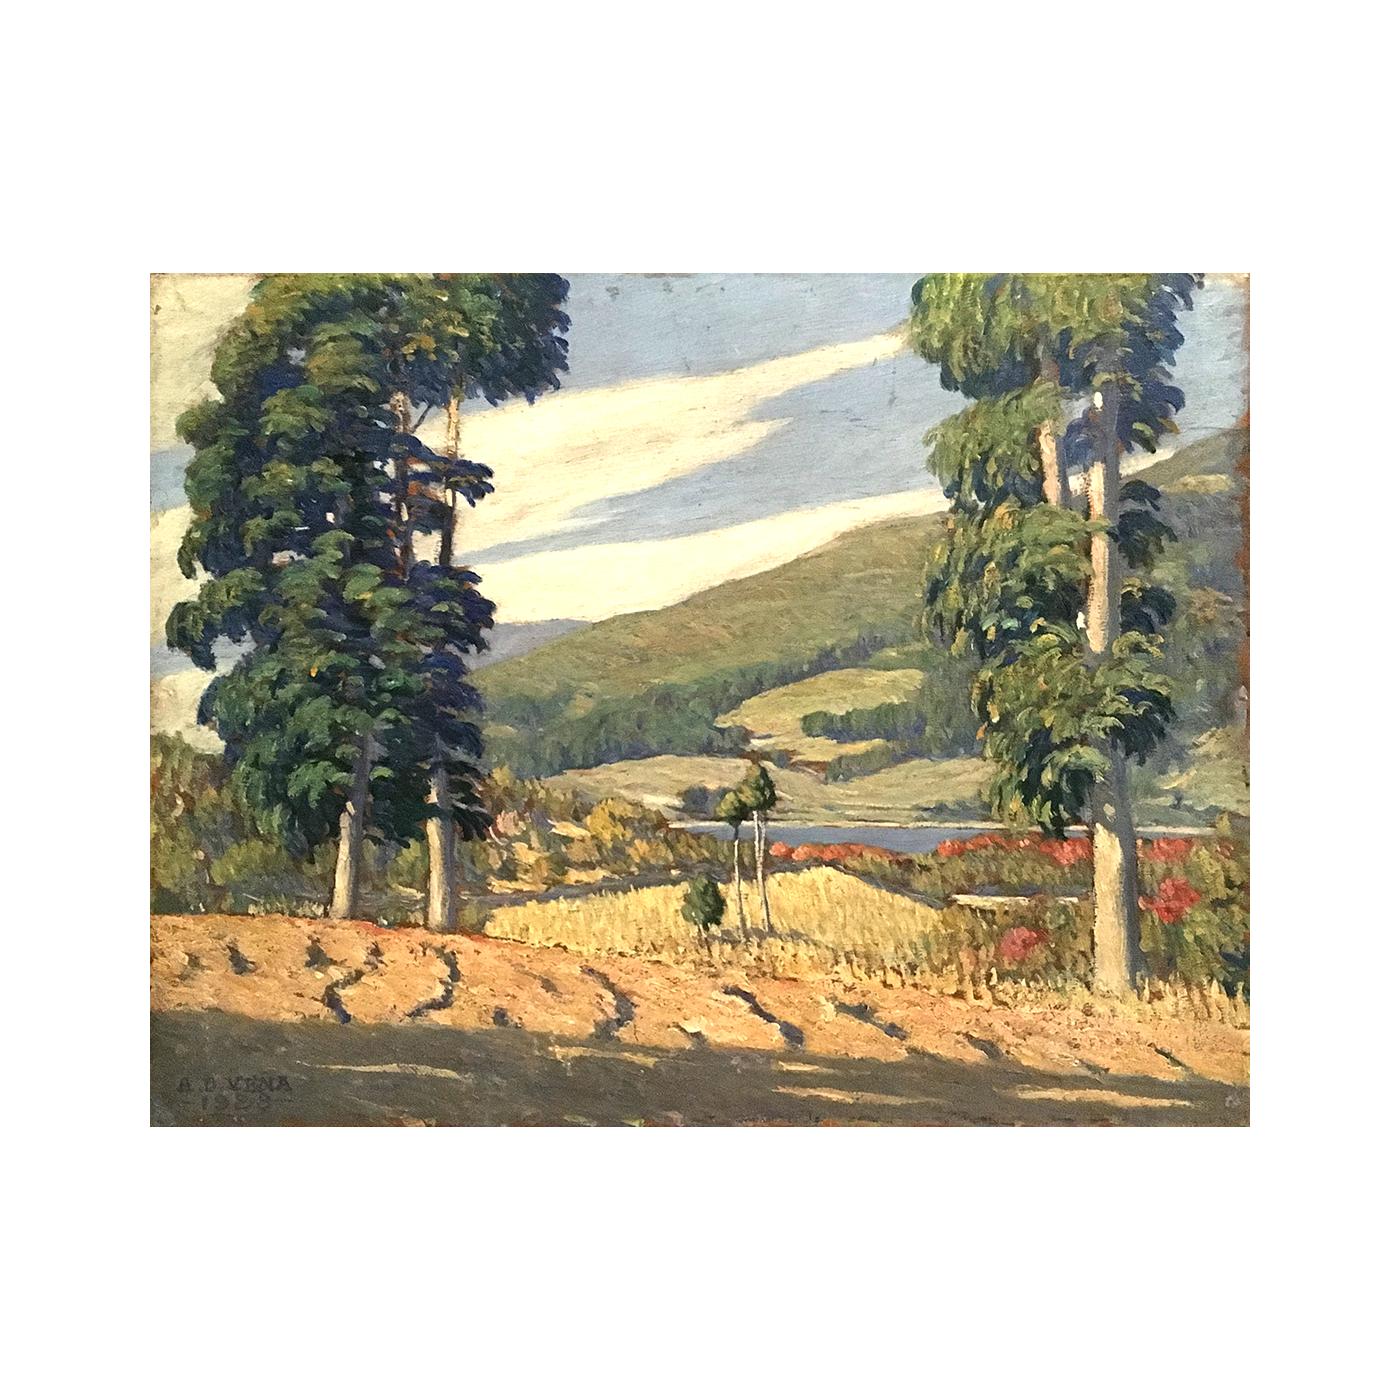 Angel Domingo Vena [1888-1963] Argentina impressionist artist Lake with mountain vista, 1923.